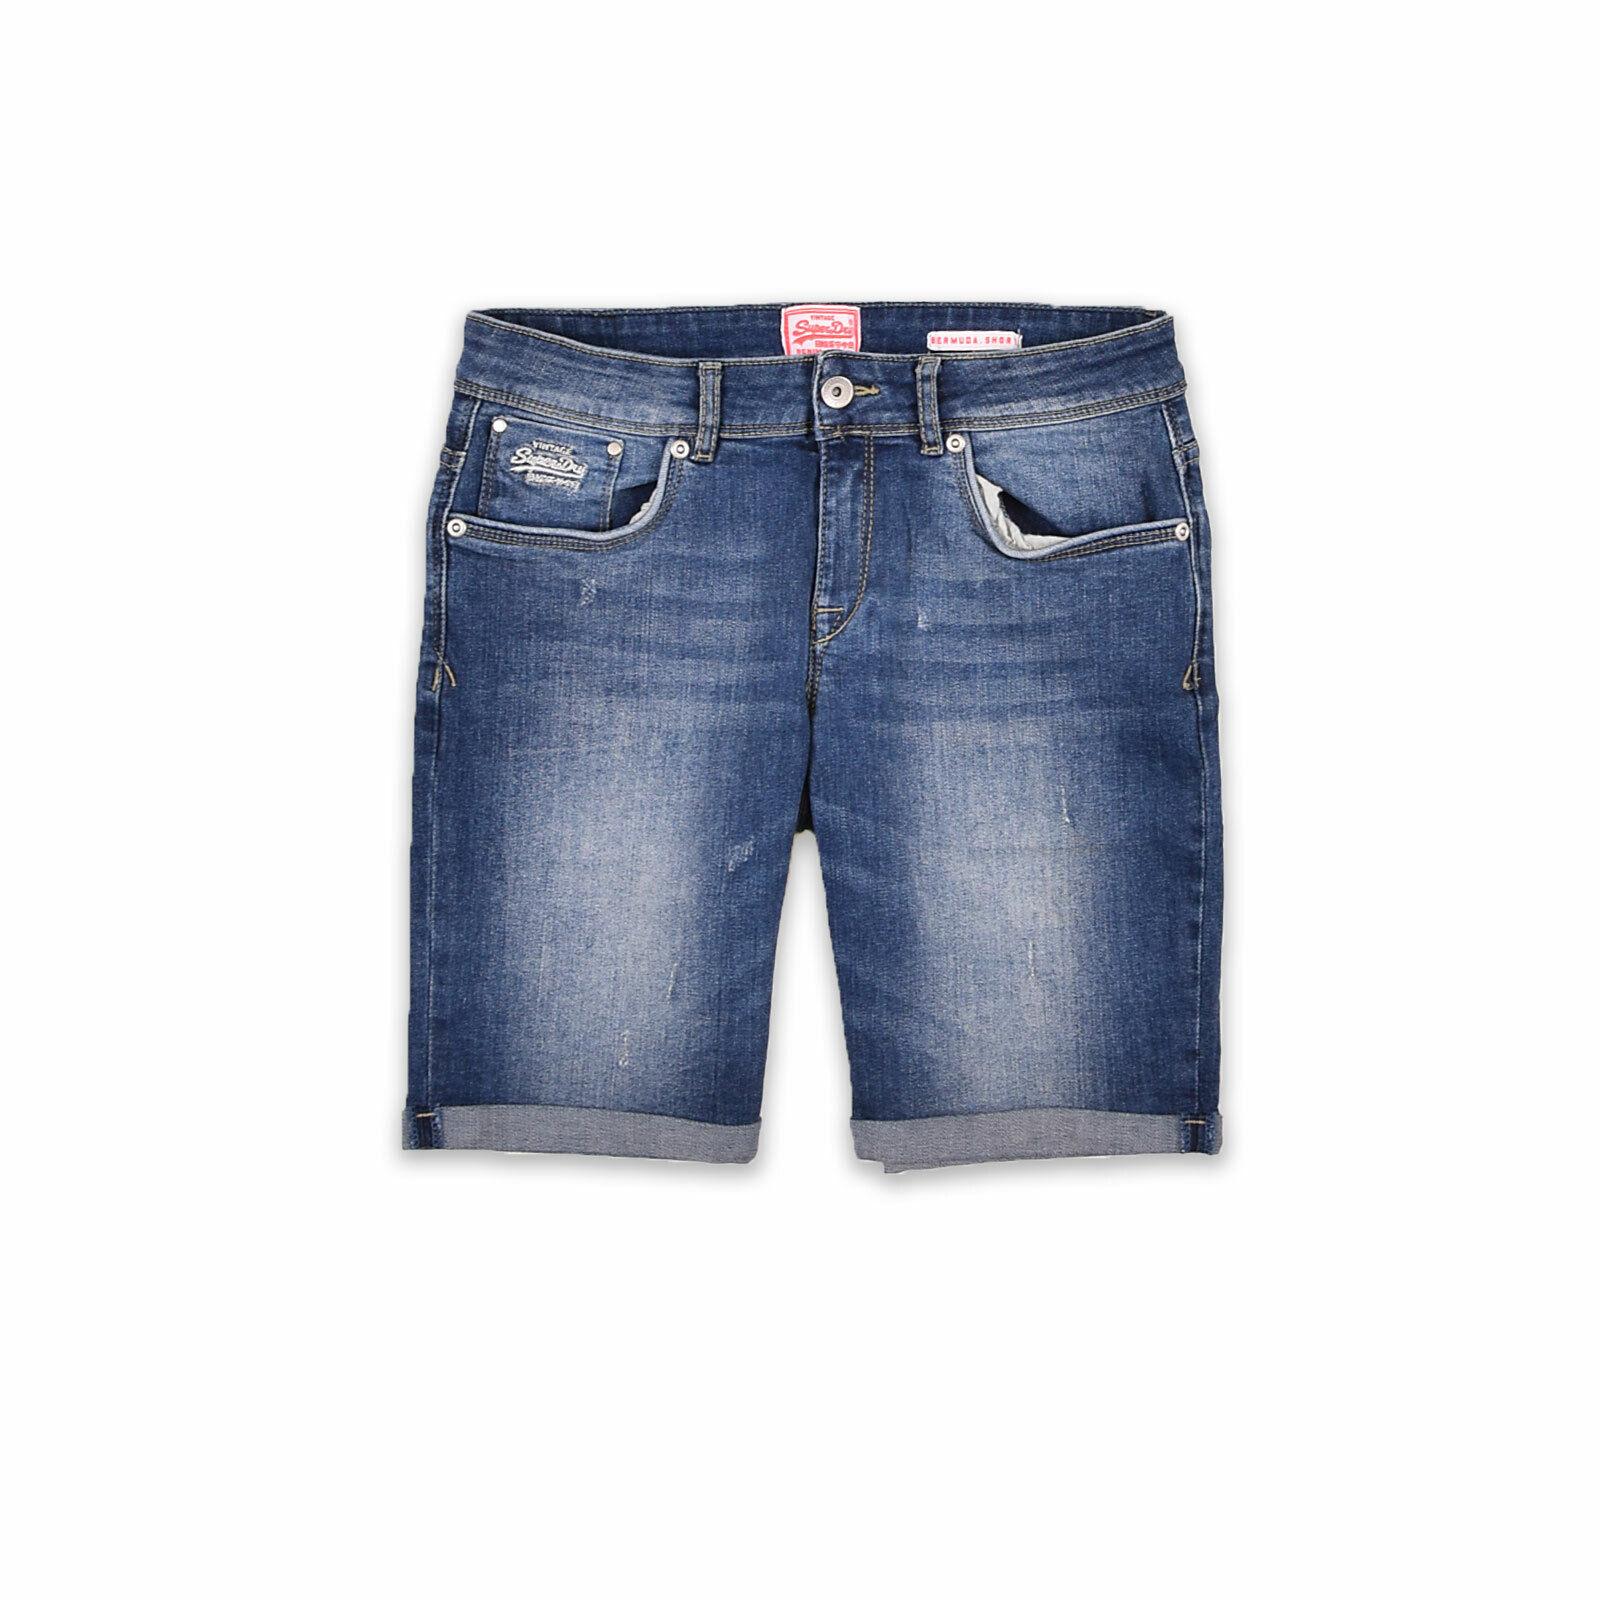 Superdry Damen Shorts Hose Freizeithose Sommer Gr.W30 Jeans Bermuda Blau 97550